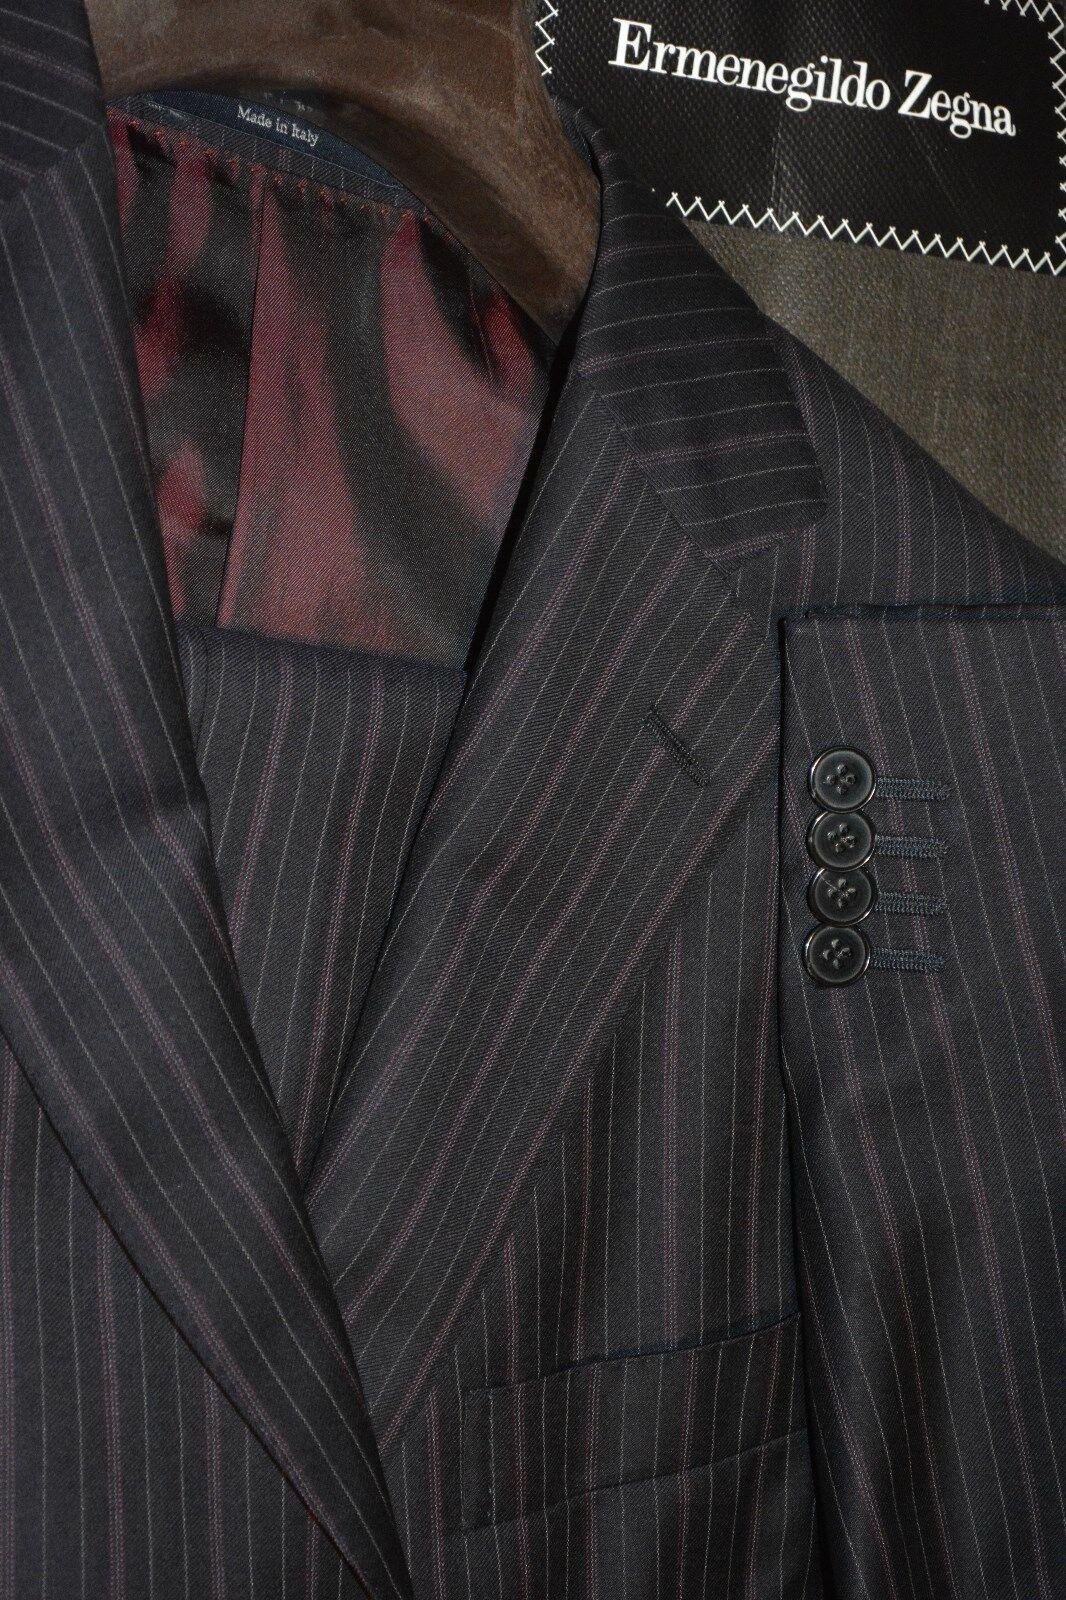 2895 Ermenegildo Zegna Navy Striped Wool Suit 38R 33W Nieman Marcus